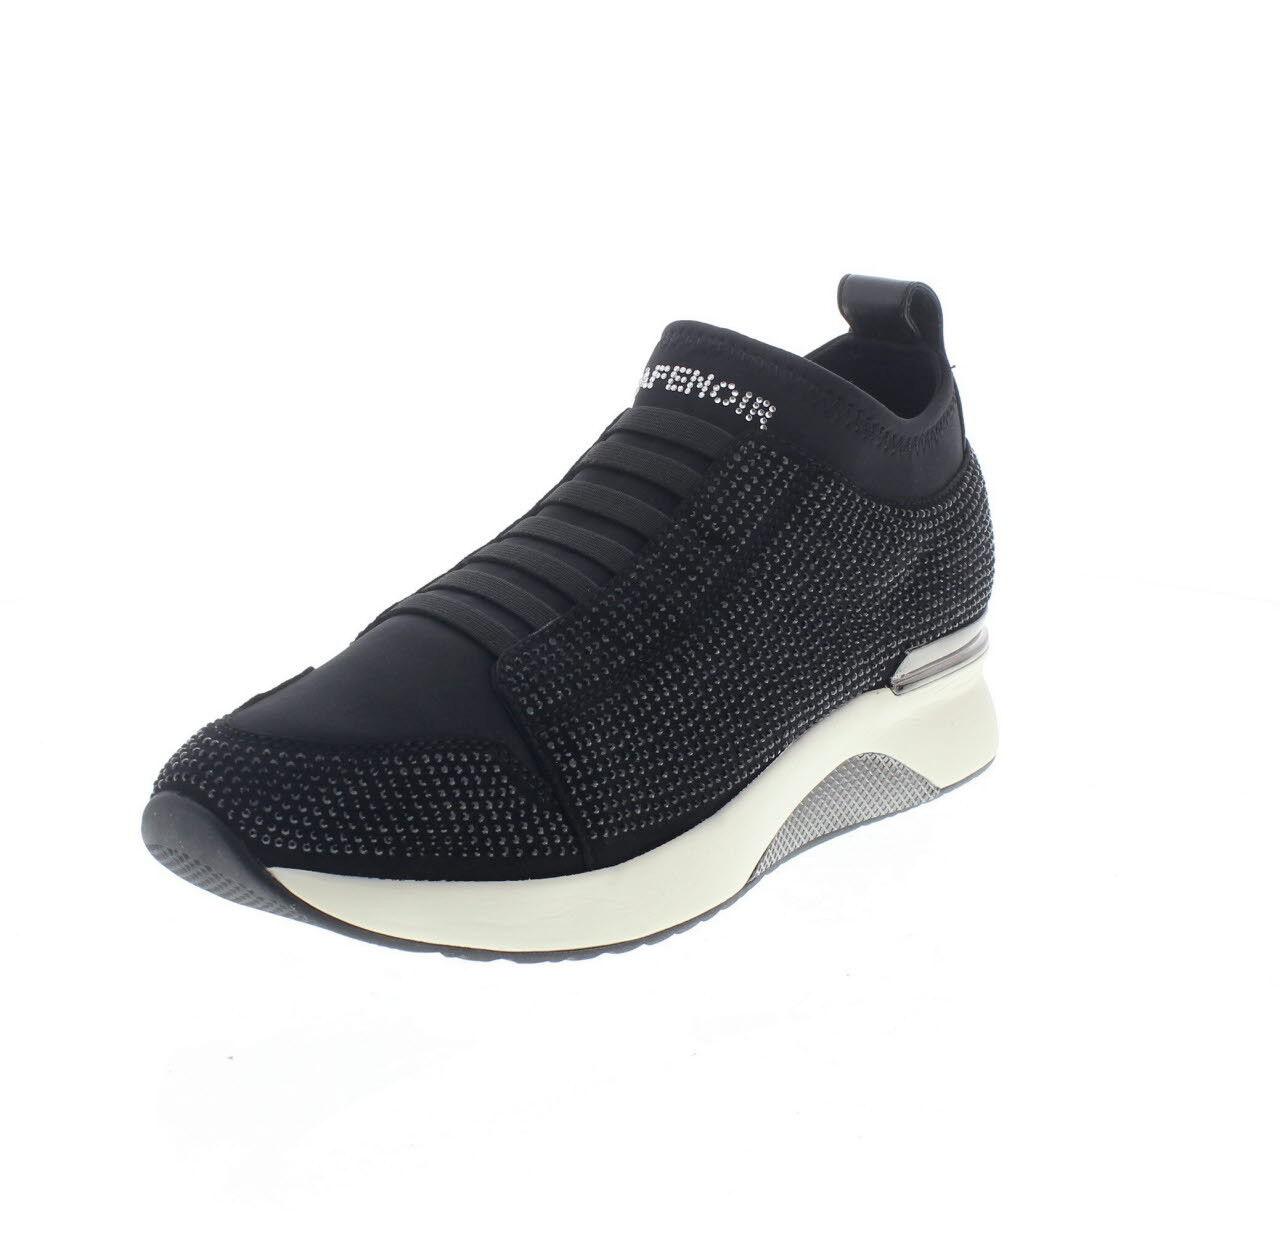 CafÈnoir Sneakers slip on blu scarpe donna DA932 39 pNsWZ